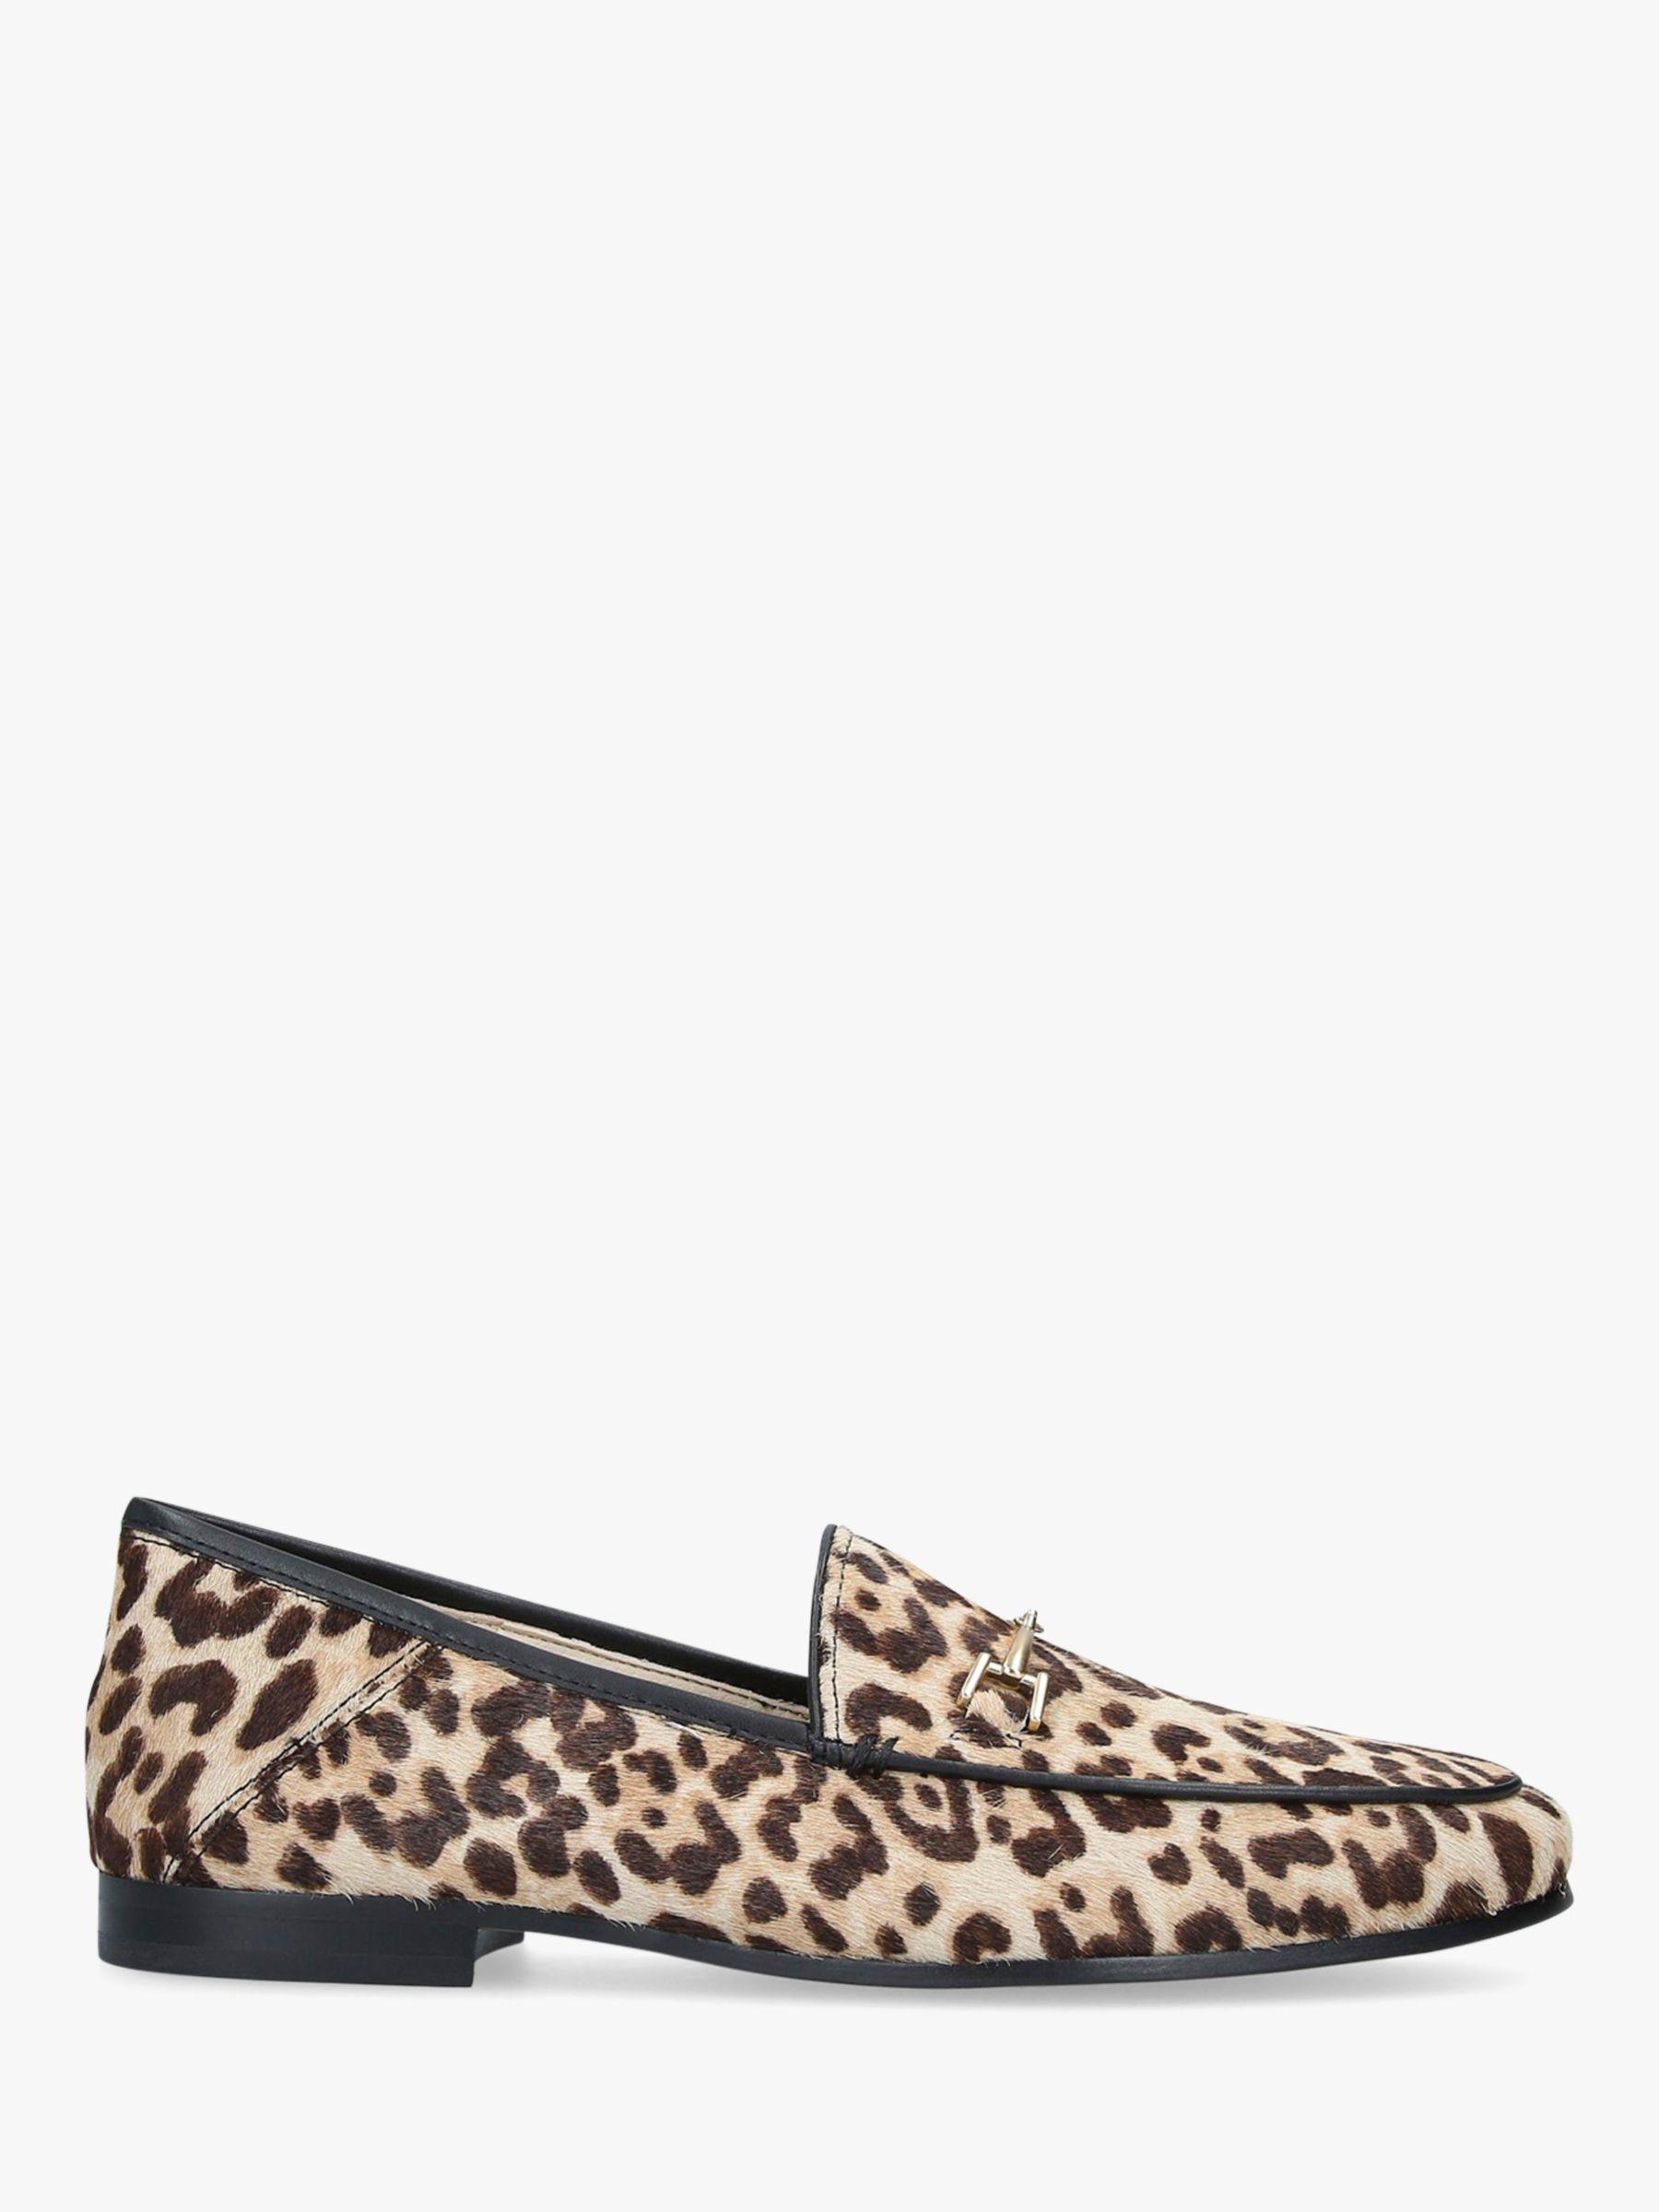 Sam Edelman Sam Edelman Loraine Leather Leopard Moccasins, Natural